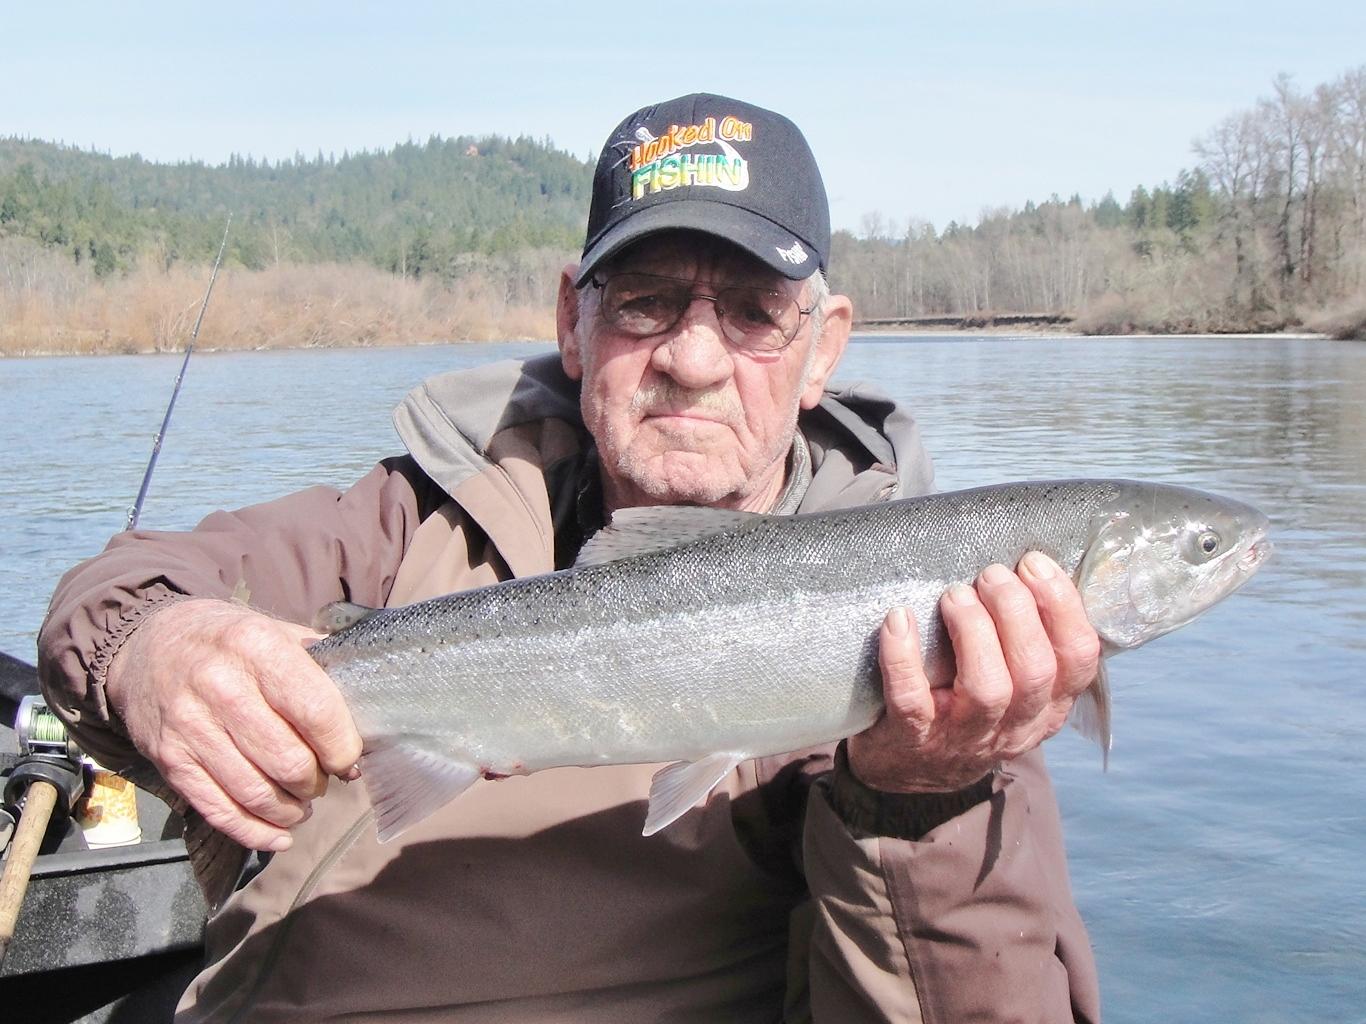 Rogue river guide 39 s fishing report rogue river fishing for Rogue river fishing guides